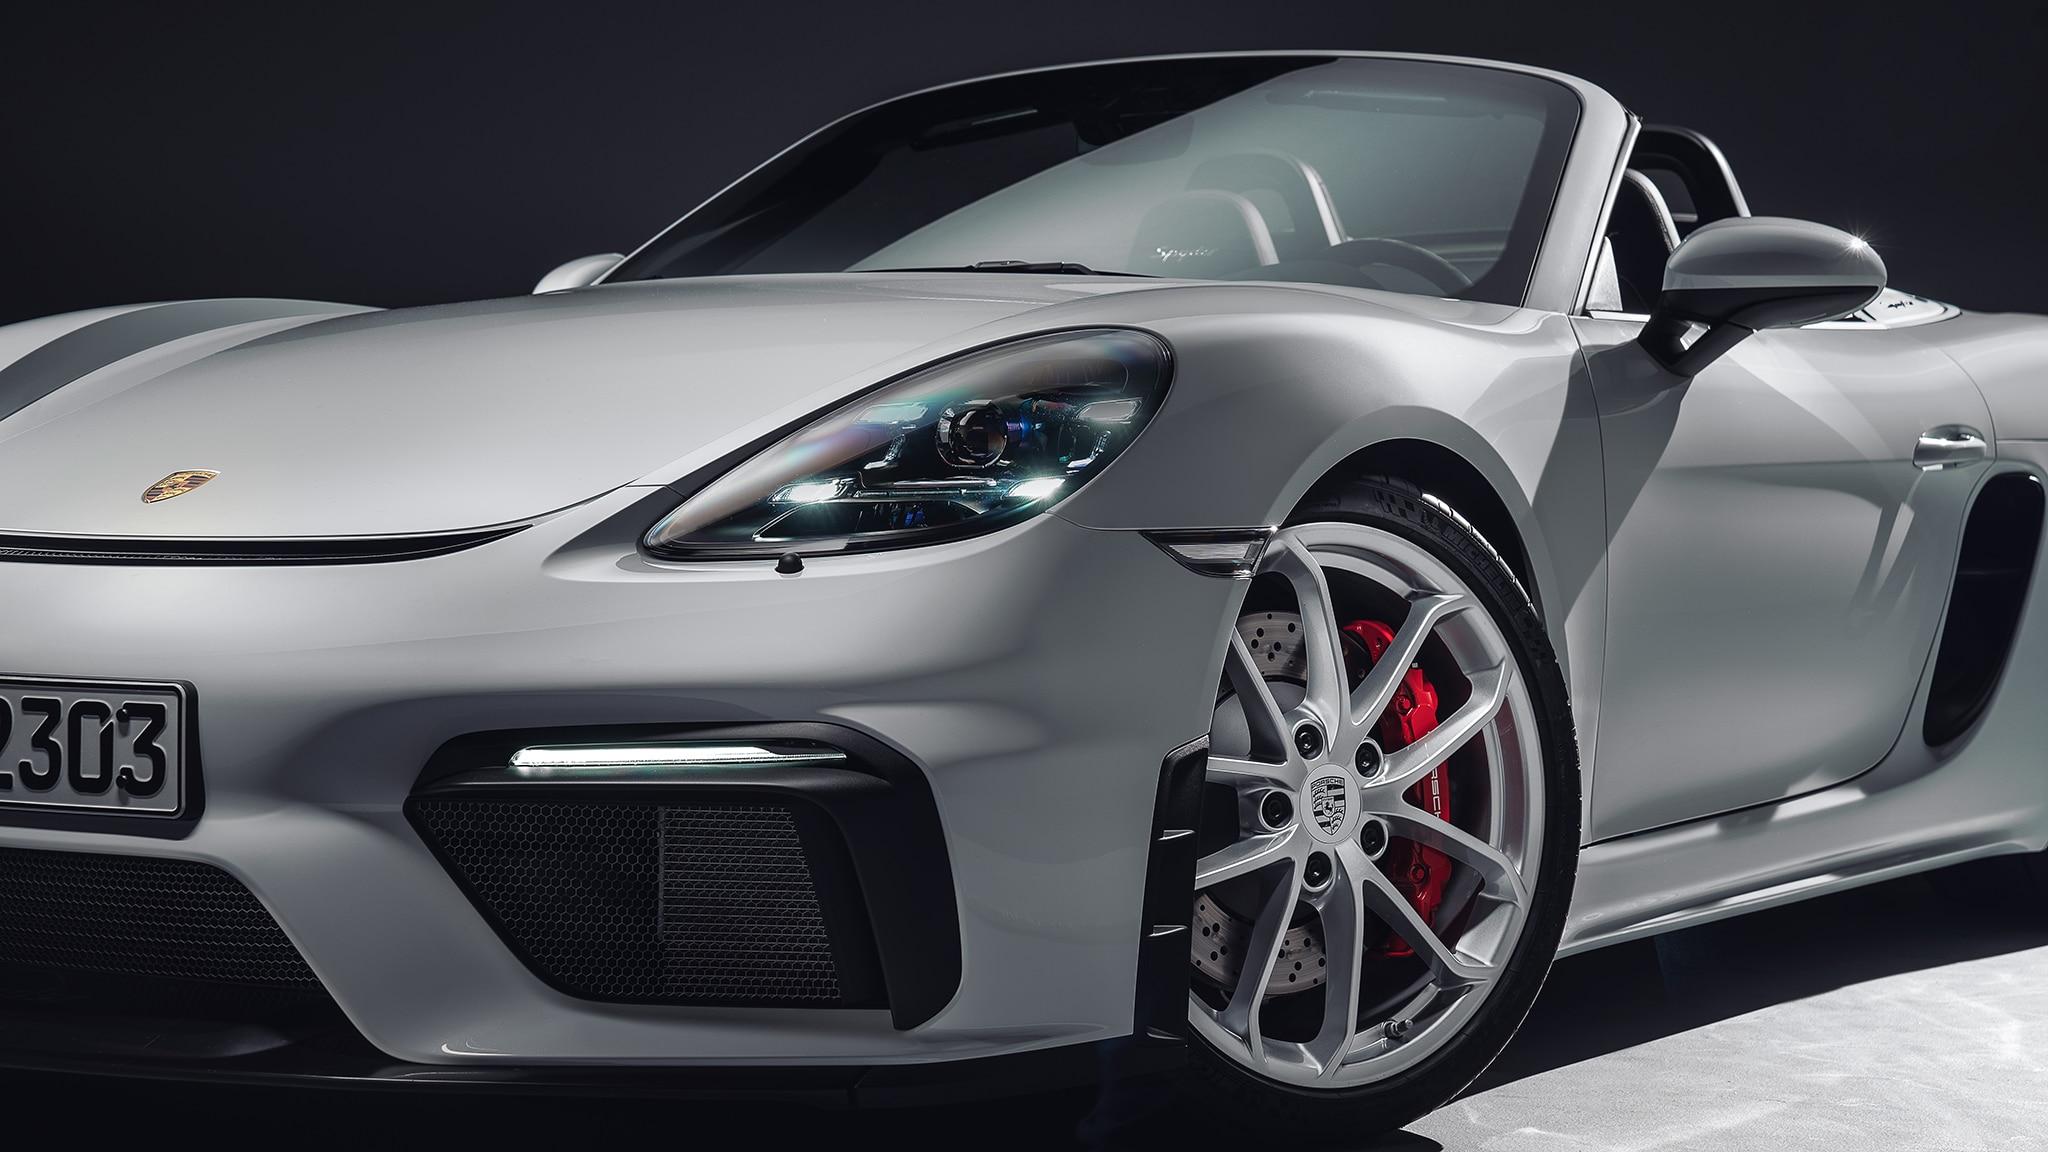 The 2020 Porsche 718 Spyder Is One Bad-Ass Boxster